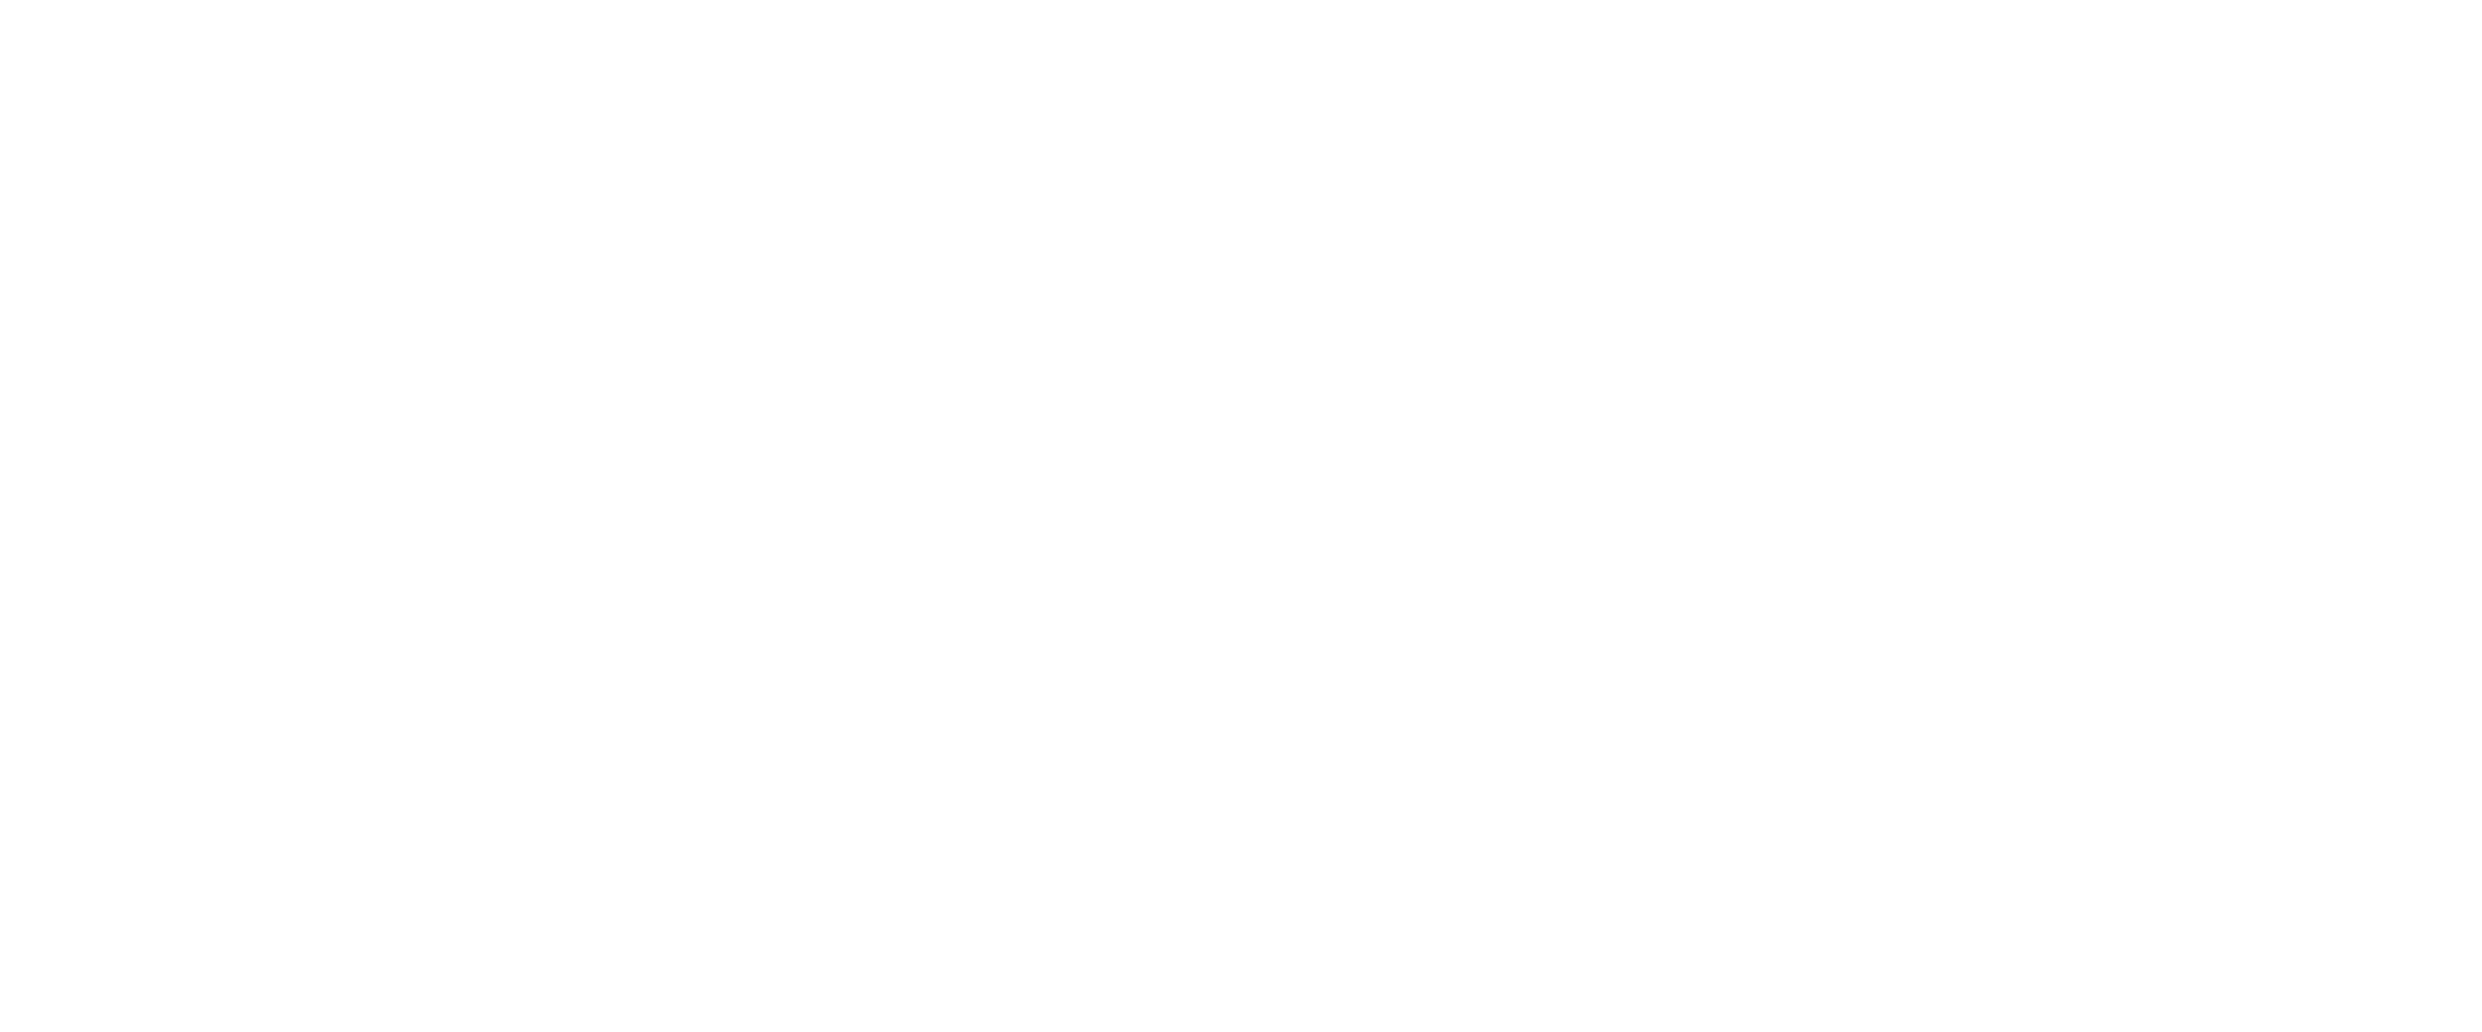 Logotipo Iphac 2019_Branco